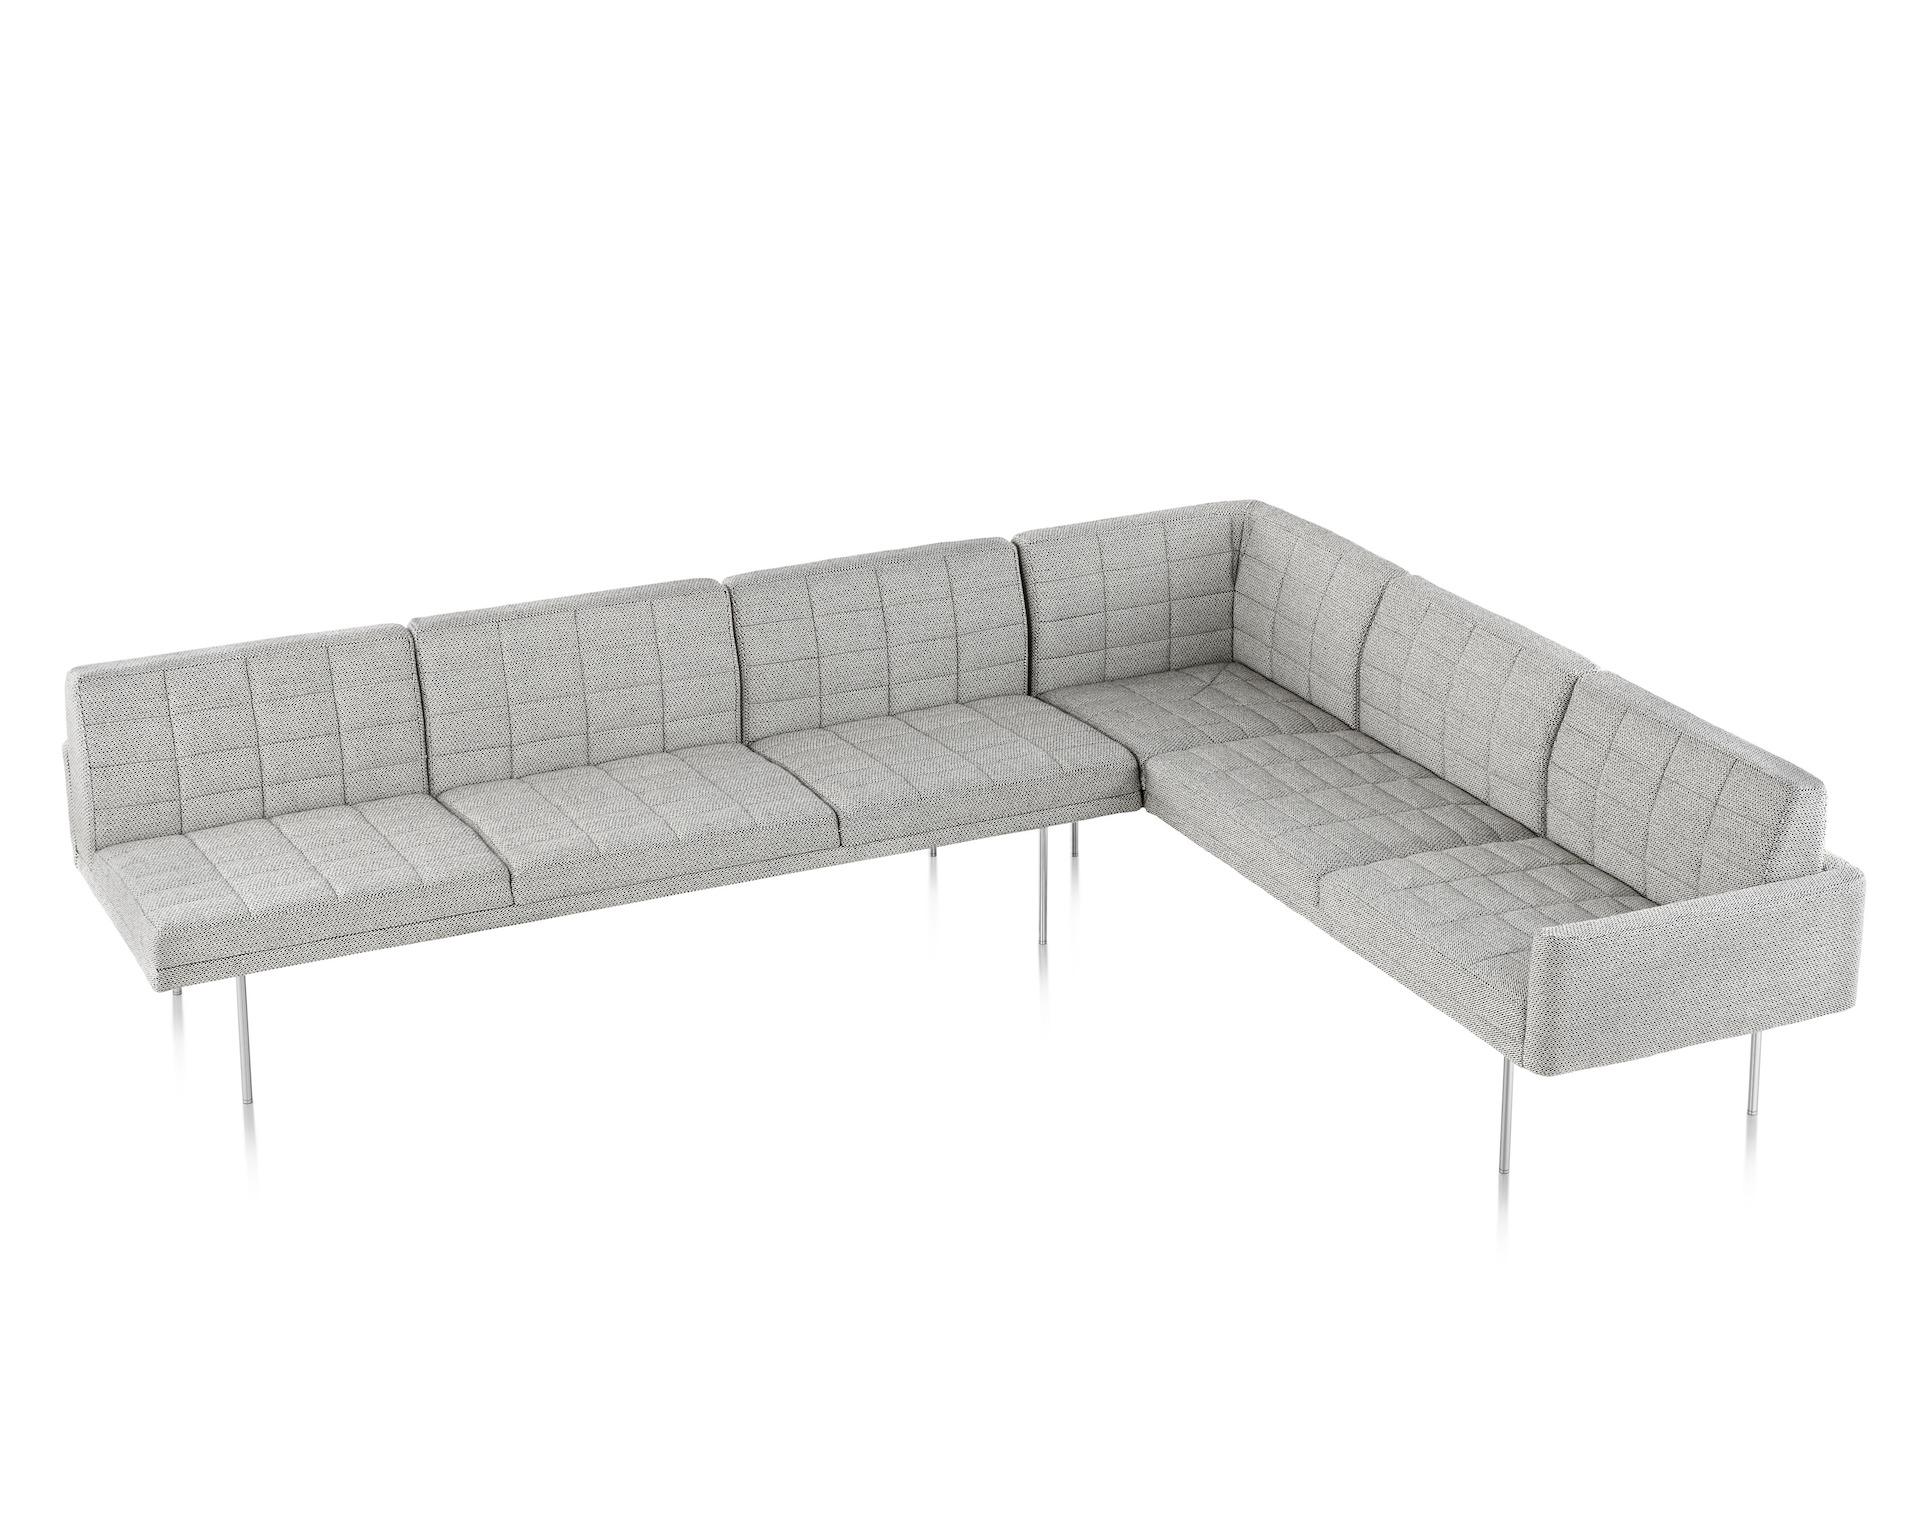 herman miller tuxedo sofa arm glass side table by geiger smart